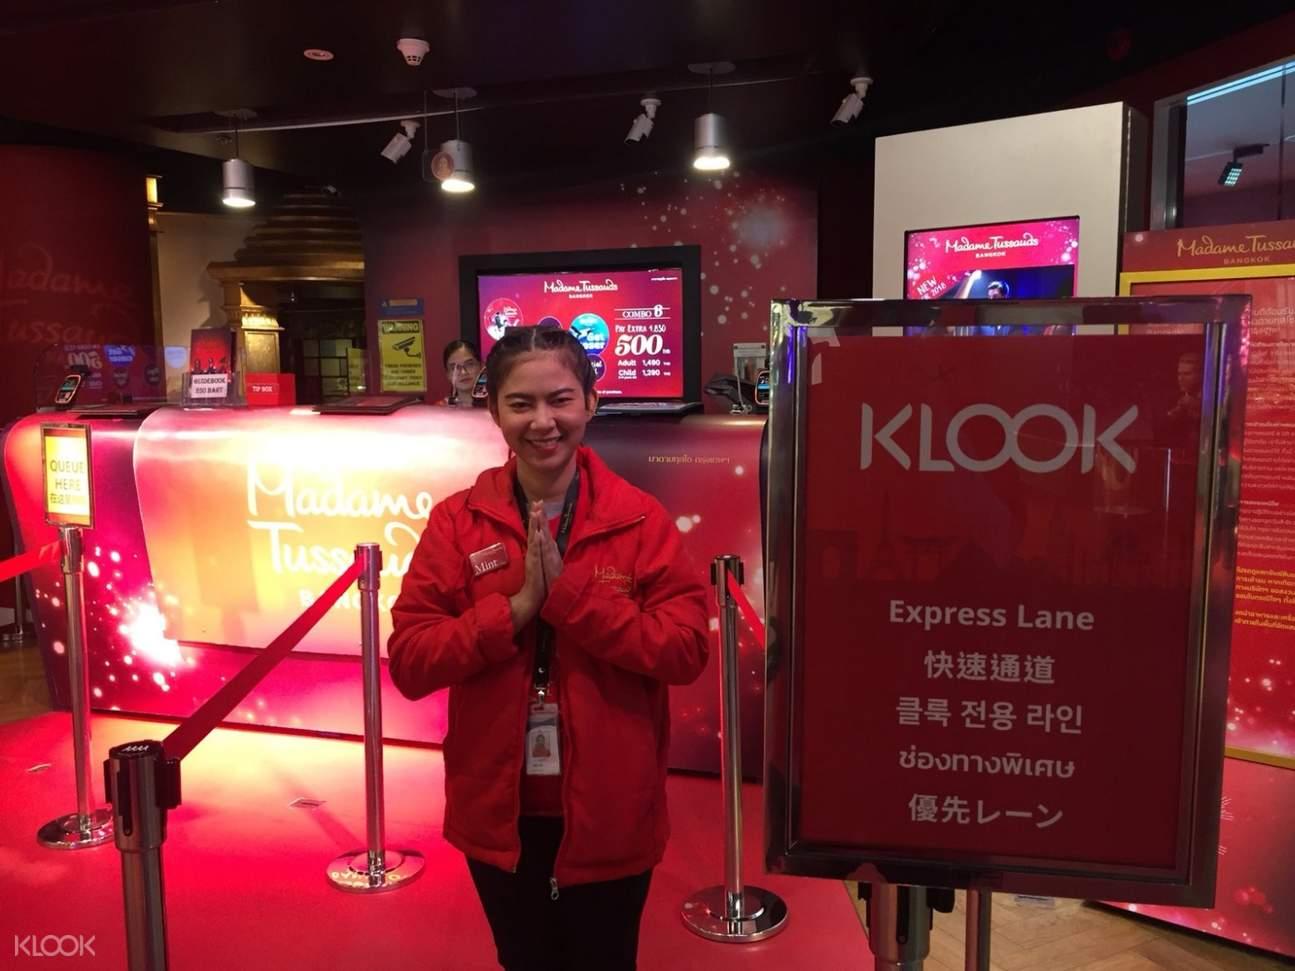 madame tussaud staff infront of klook express lane